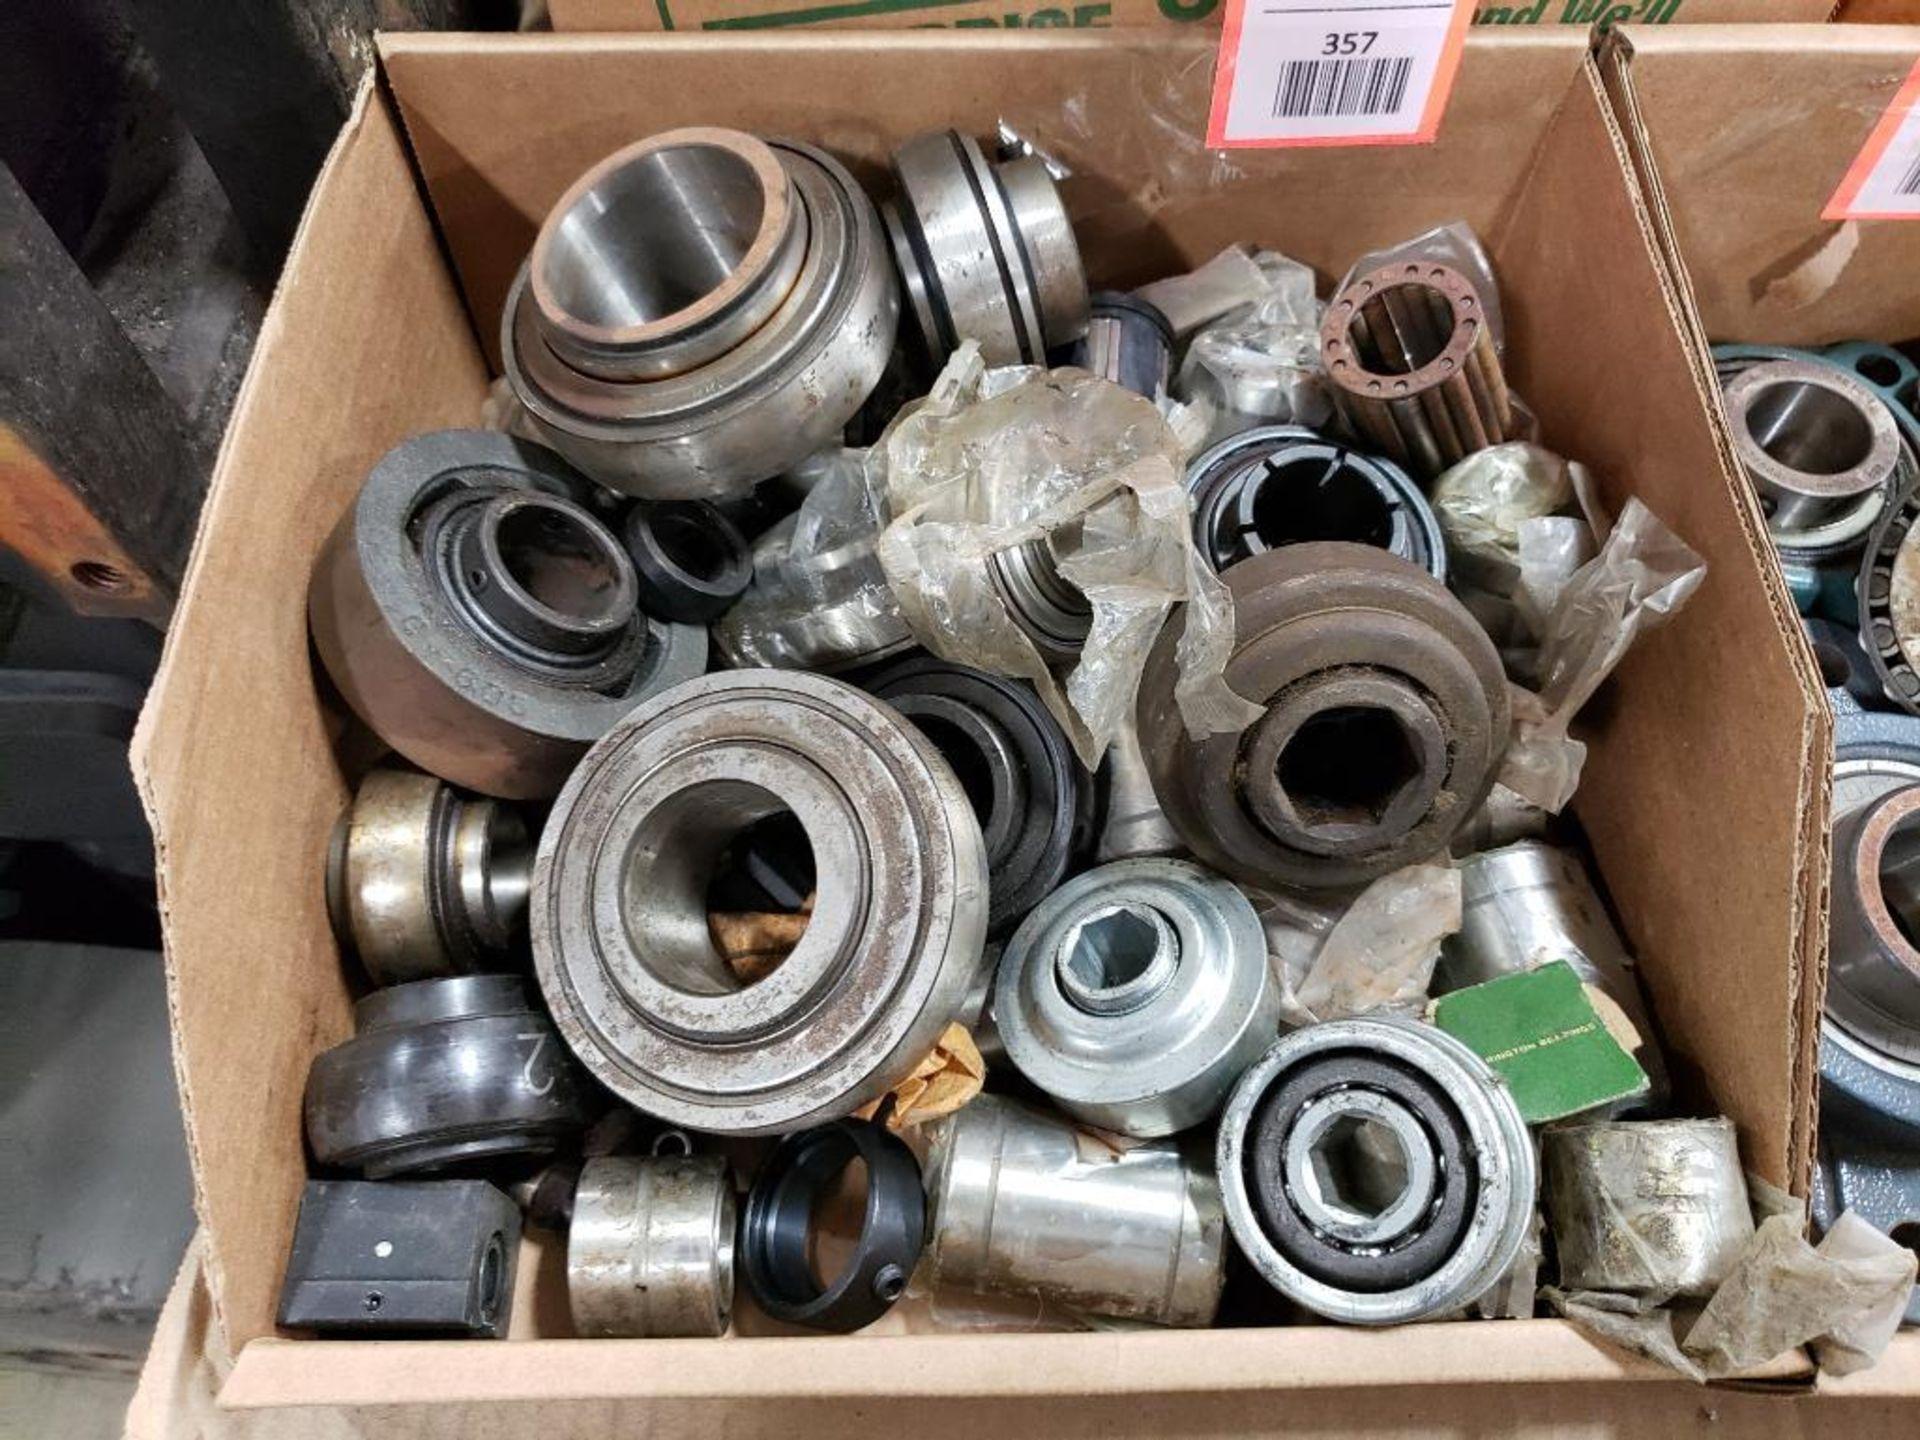 Assorted bearings.